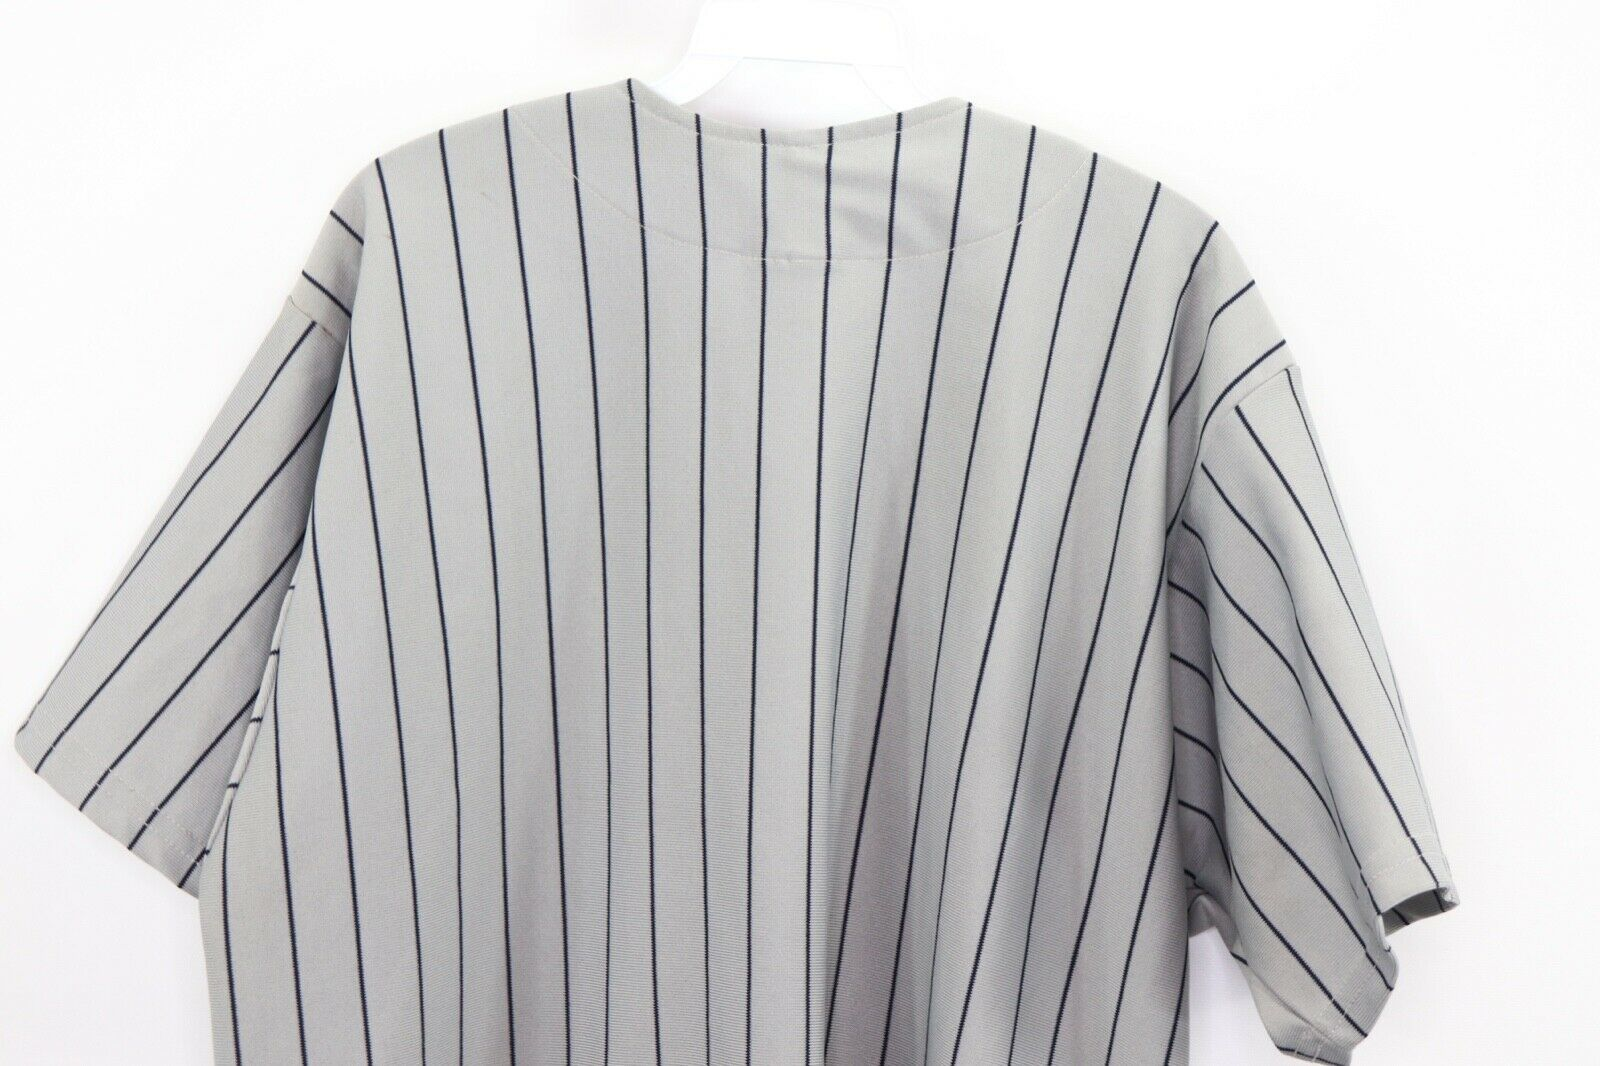 Vintage 90s Mens XL New York Yankees MLB Baseball Jersey Pinstripe Gray Blue image 7